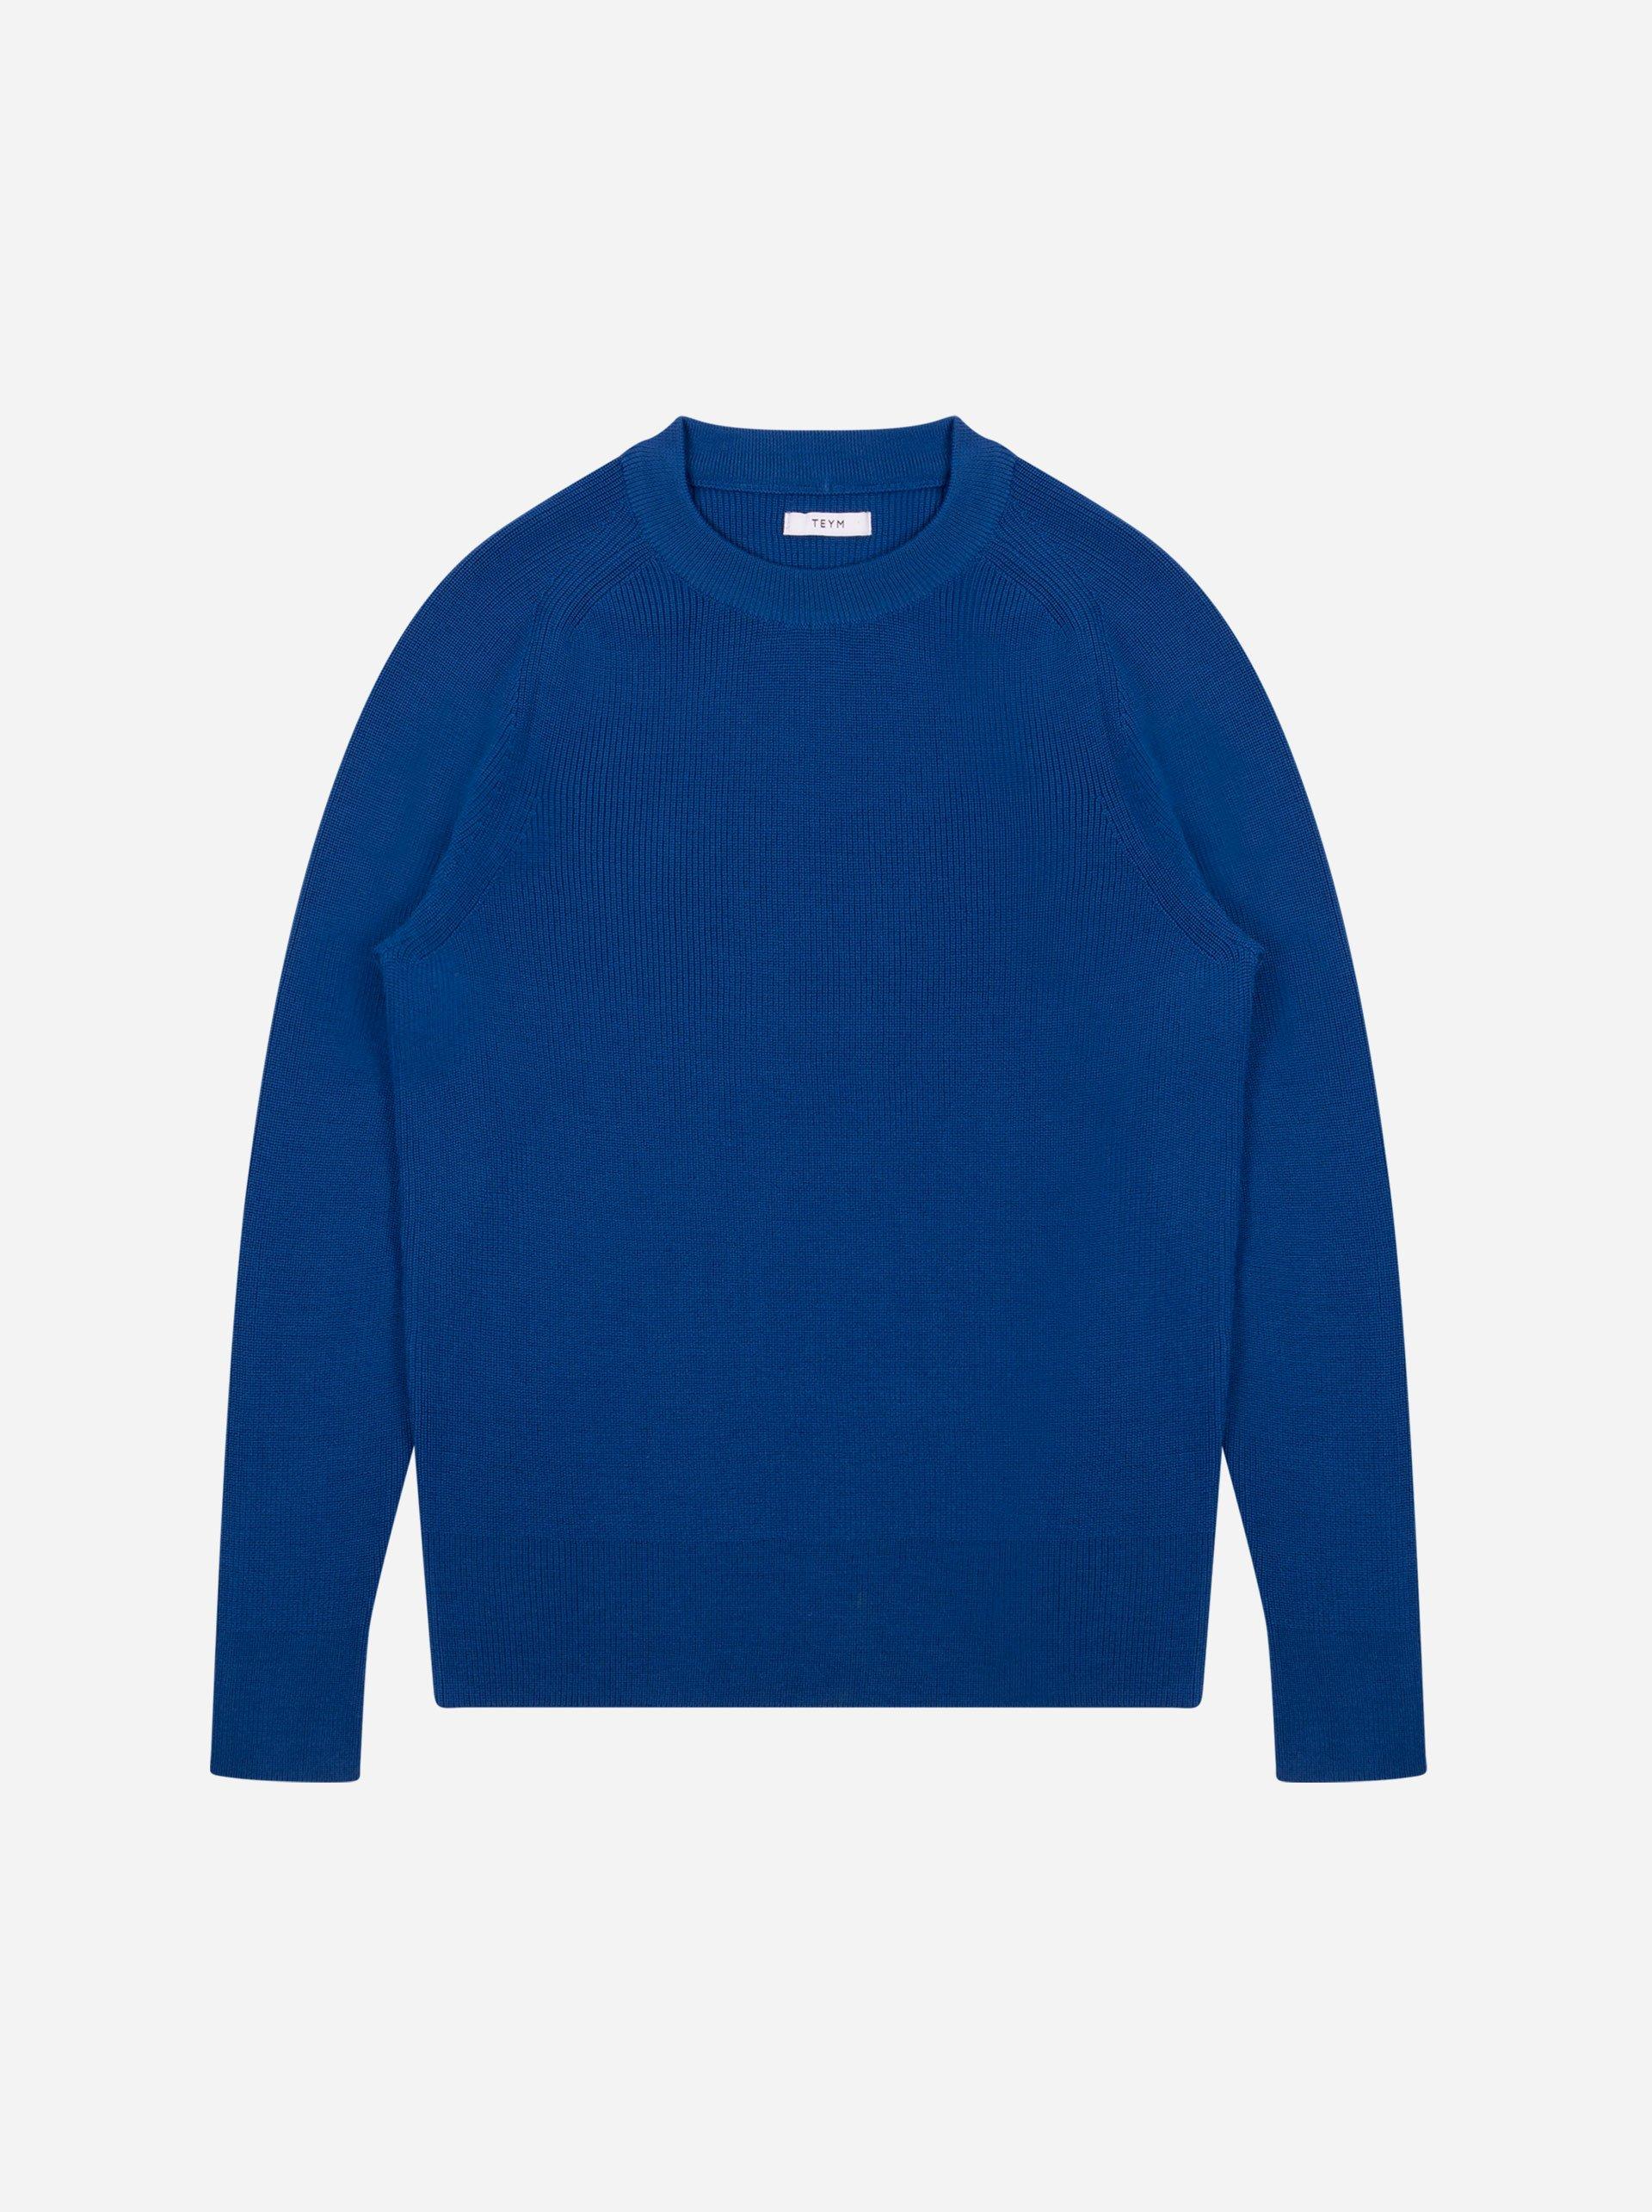 Teym - Crewneck - The Merino Sweater - Women - Cobalt Blue - 5